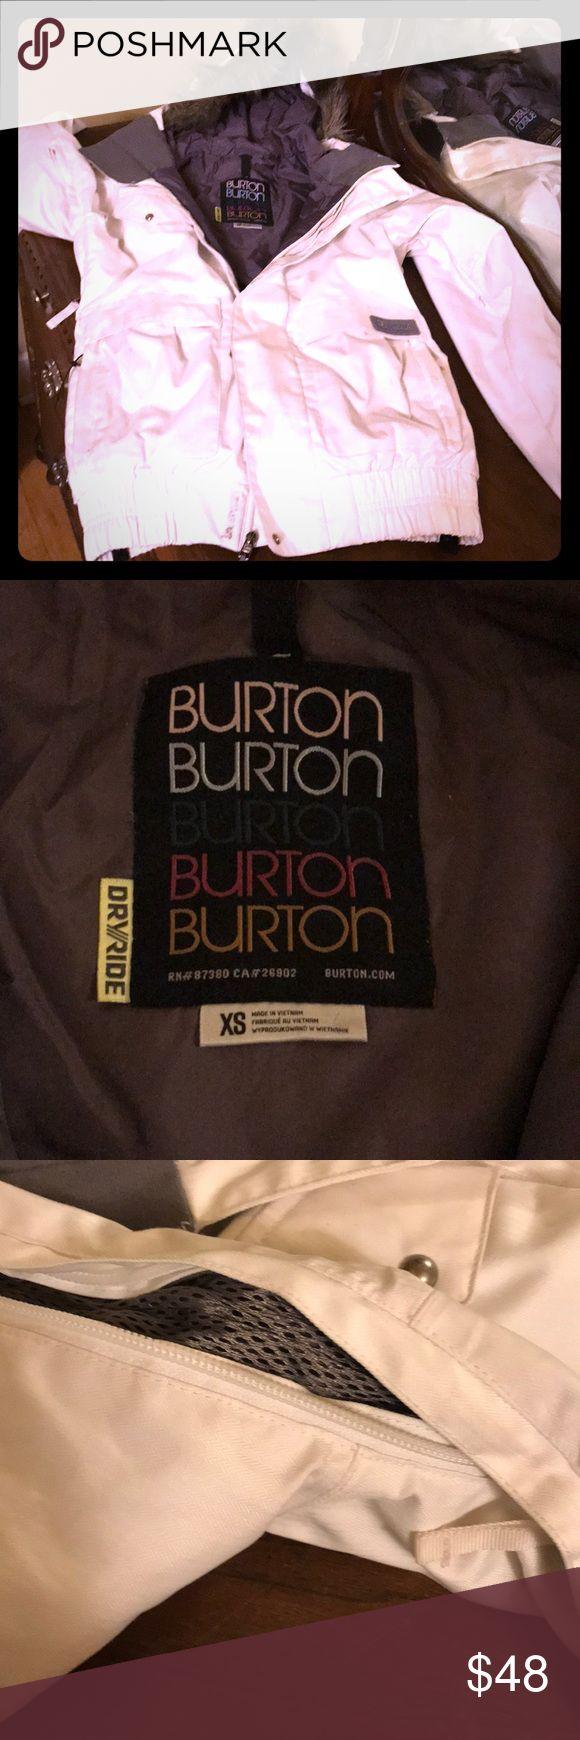 Burton ski shell Great ski jacket bu Burton. Hooded, pit zips, minimal wear n tear. Zipper front with exterior snaps as well. Burton Jackets & Coats